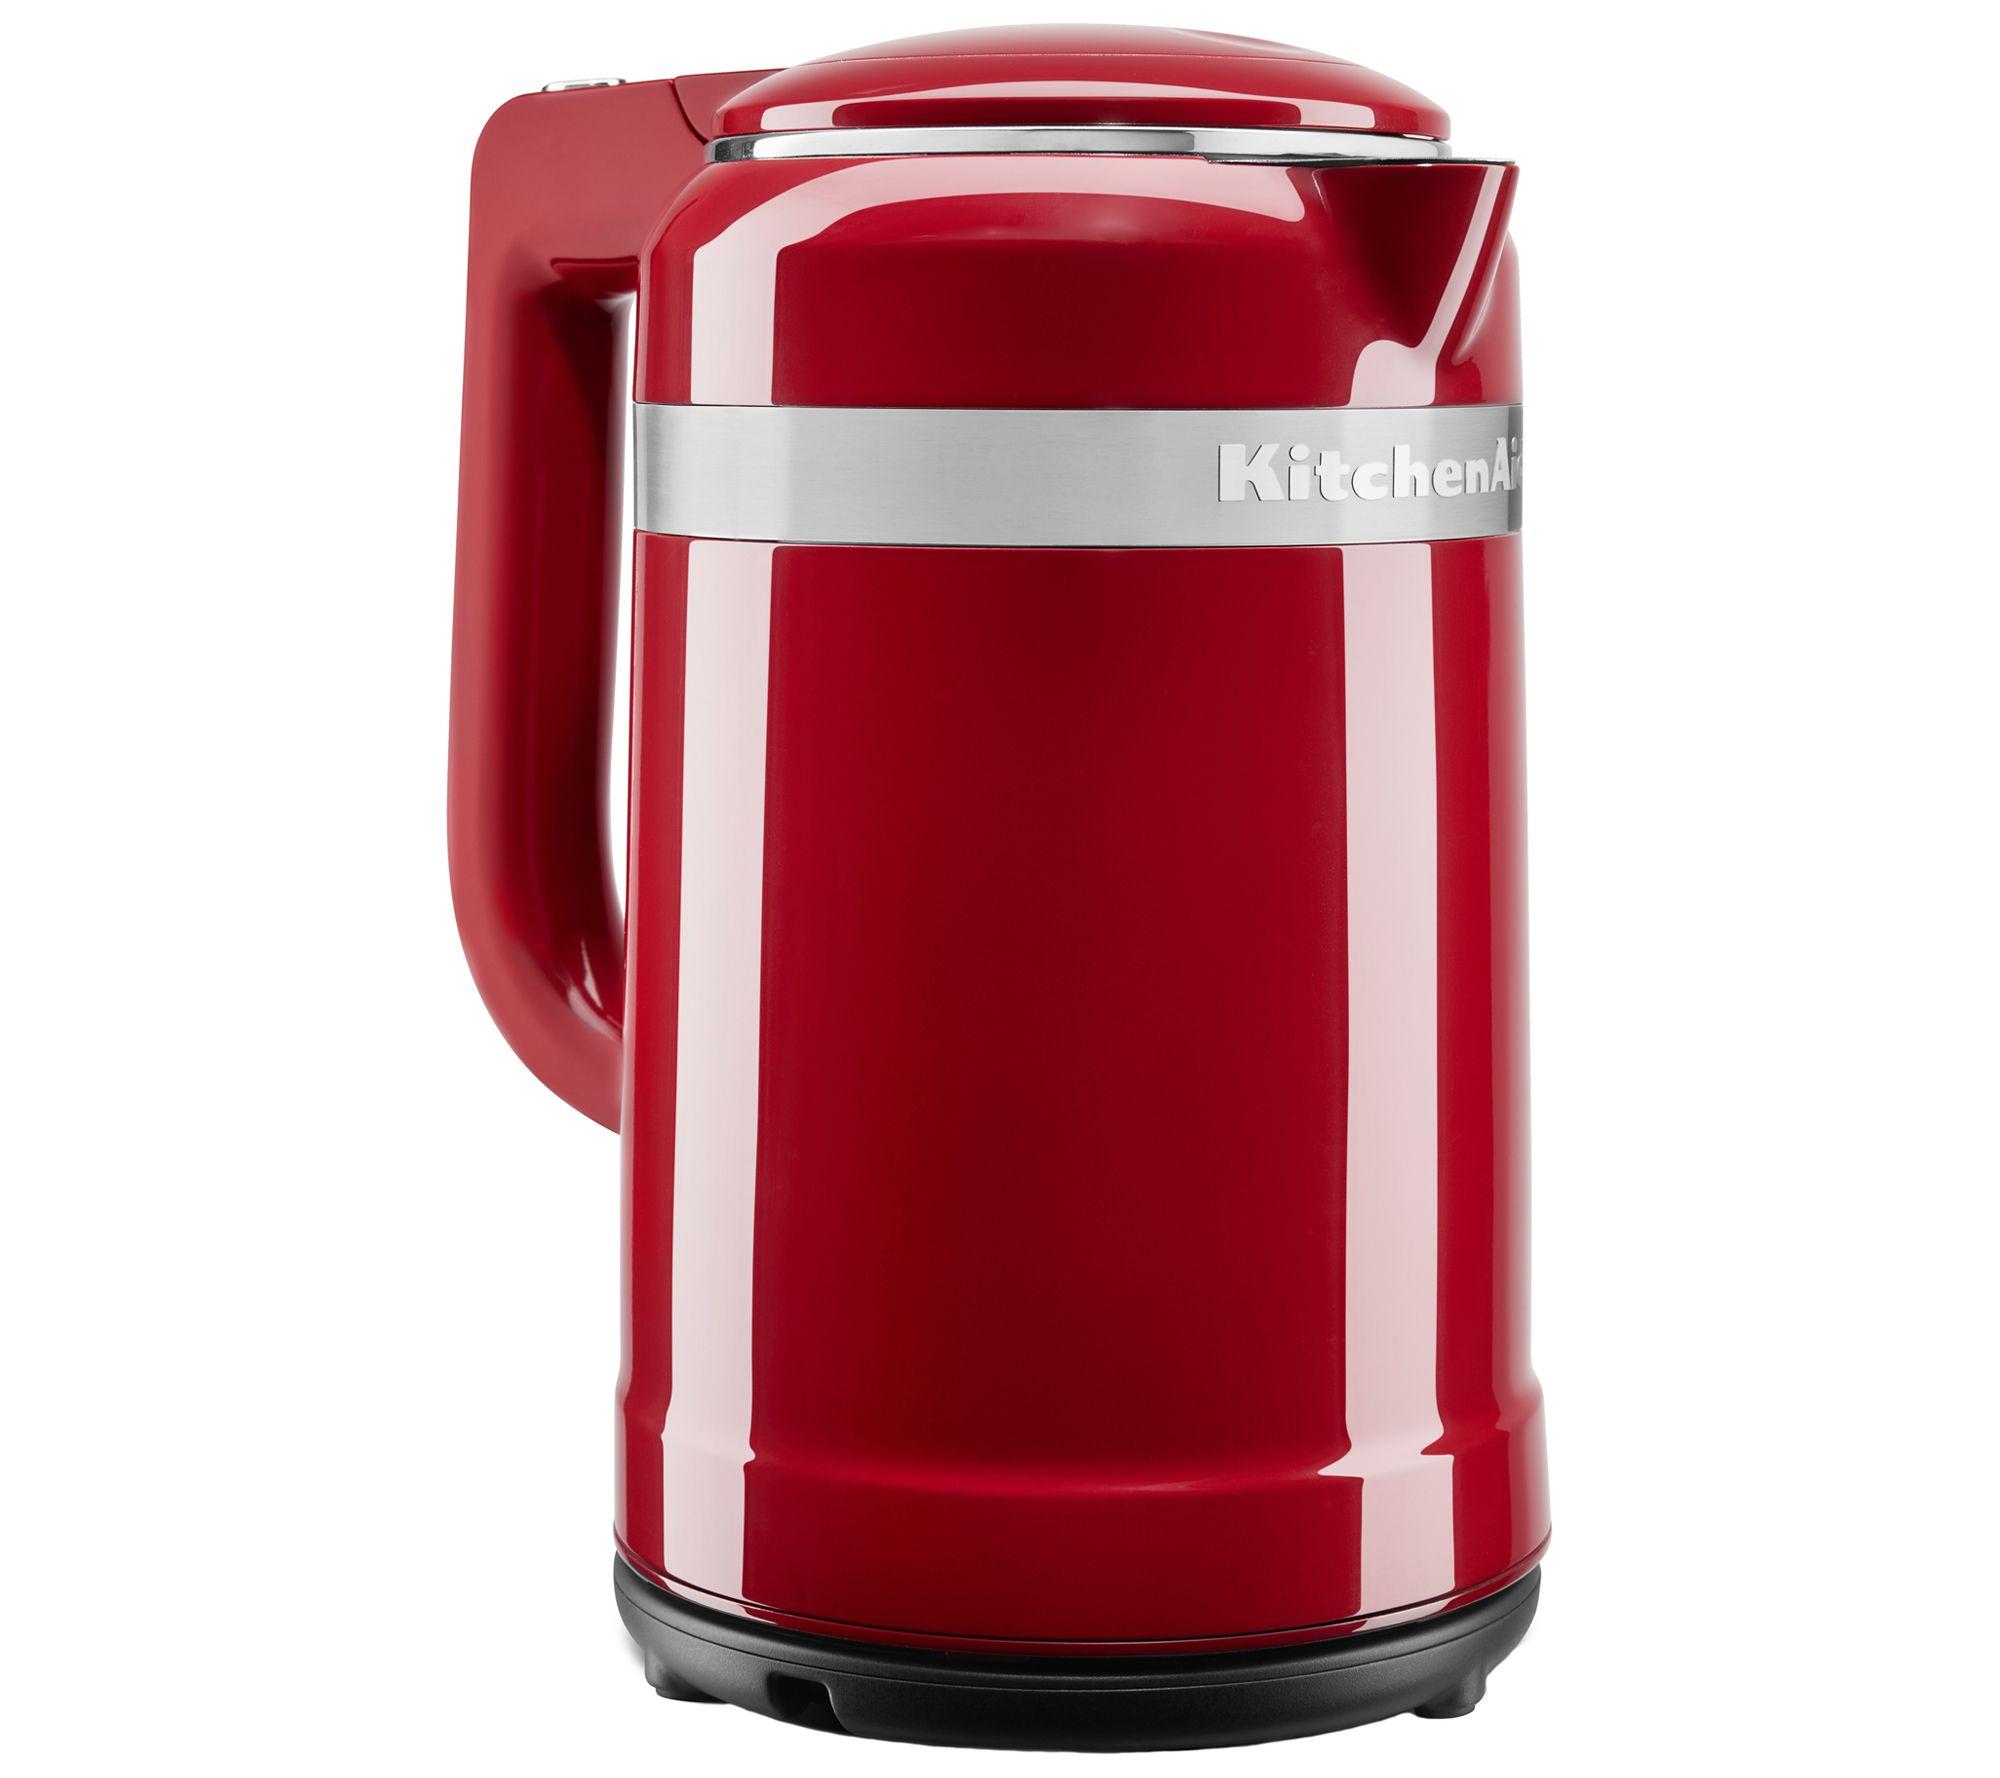 KitchenAid 1.5-Liter Electric Kettle — QVC.com